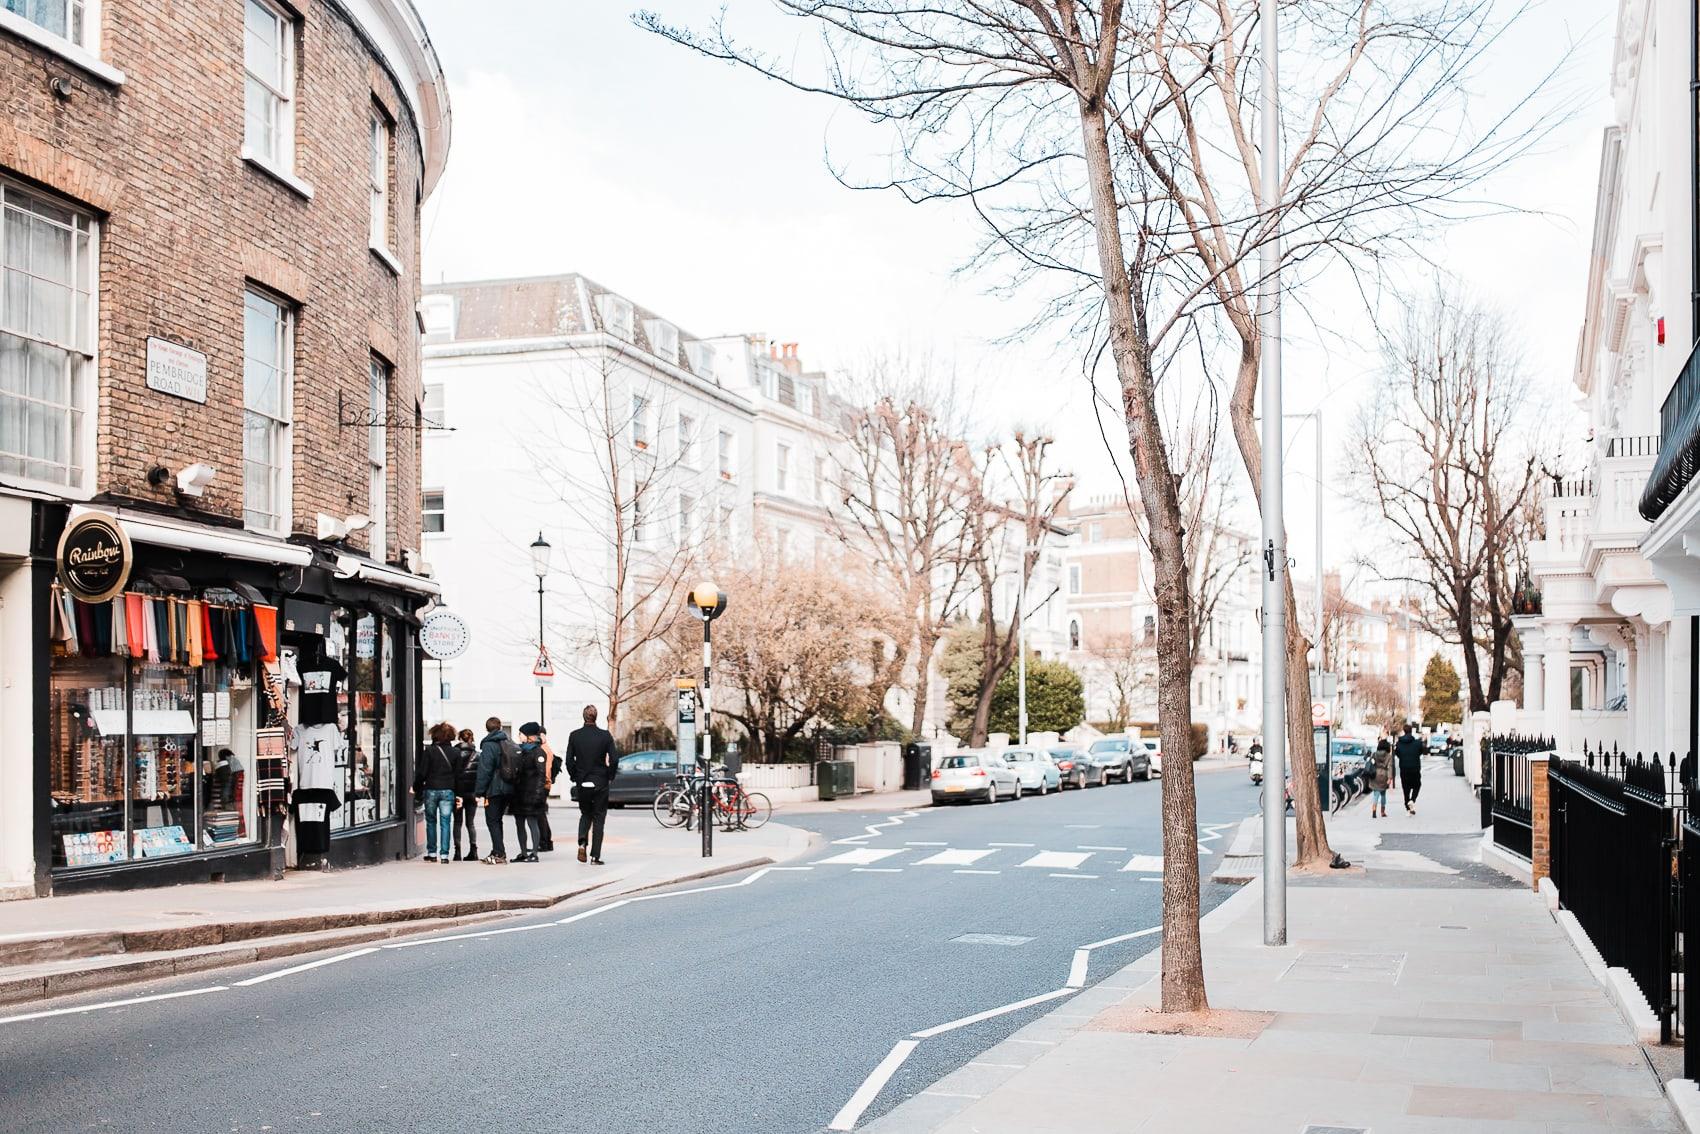 5 jours à Londres, part.1 : Hyde Park, Camden Town & Notting Hill